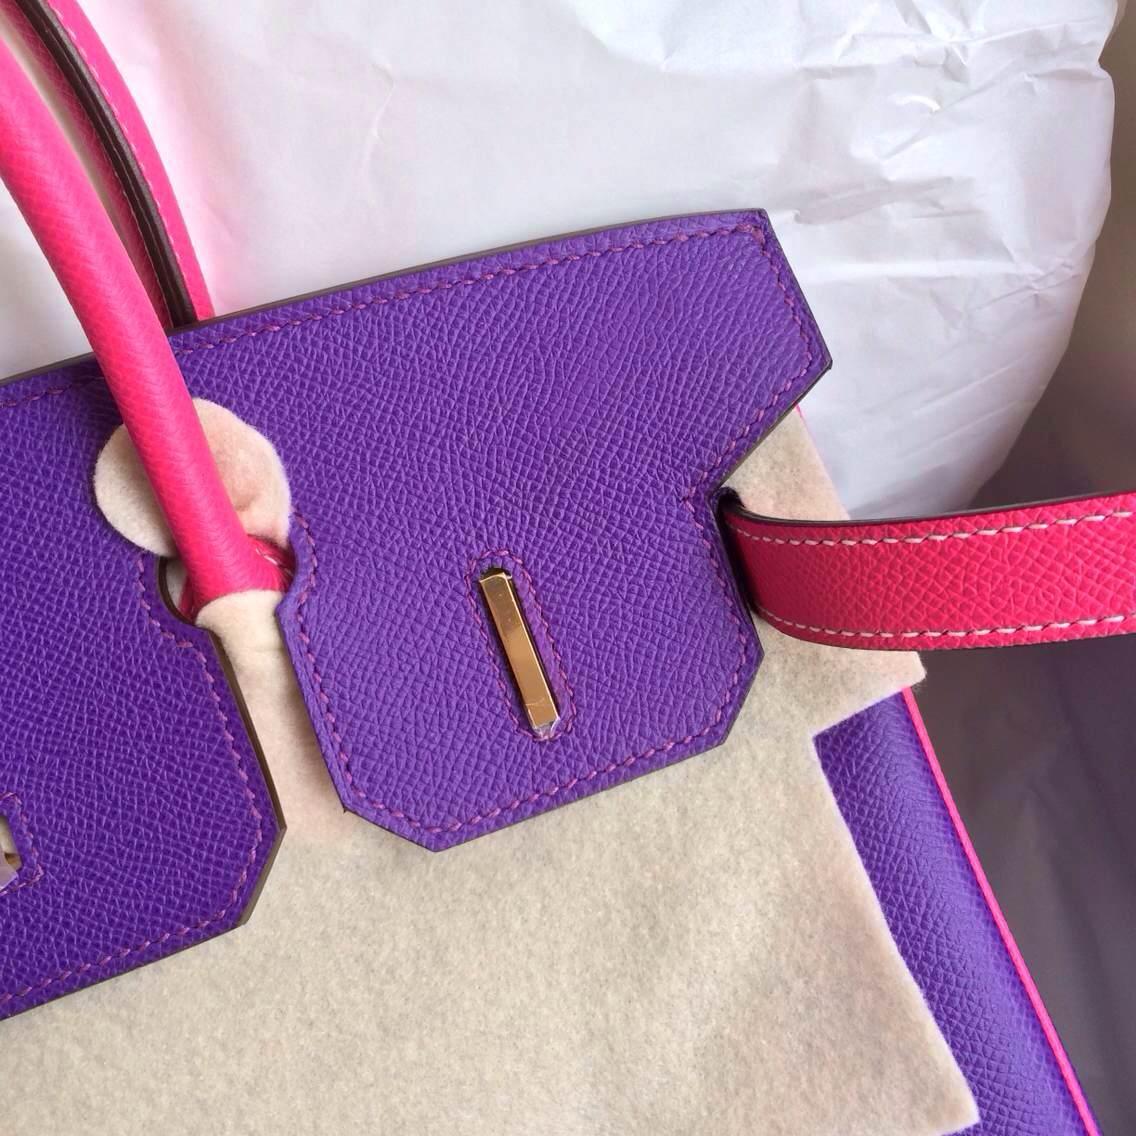 Cheap Hermes Birkin Bag 9W Ultraviolet/E5 Rose Tyrien Epsom Leather Gold Hardware